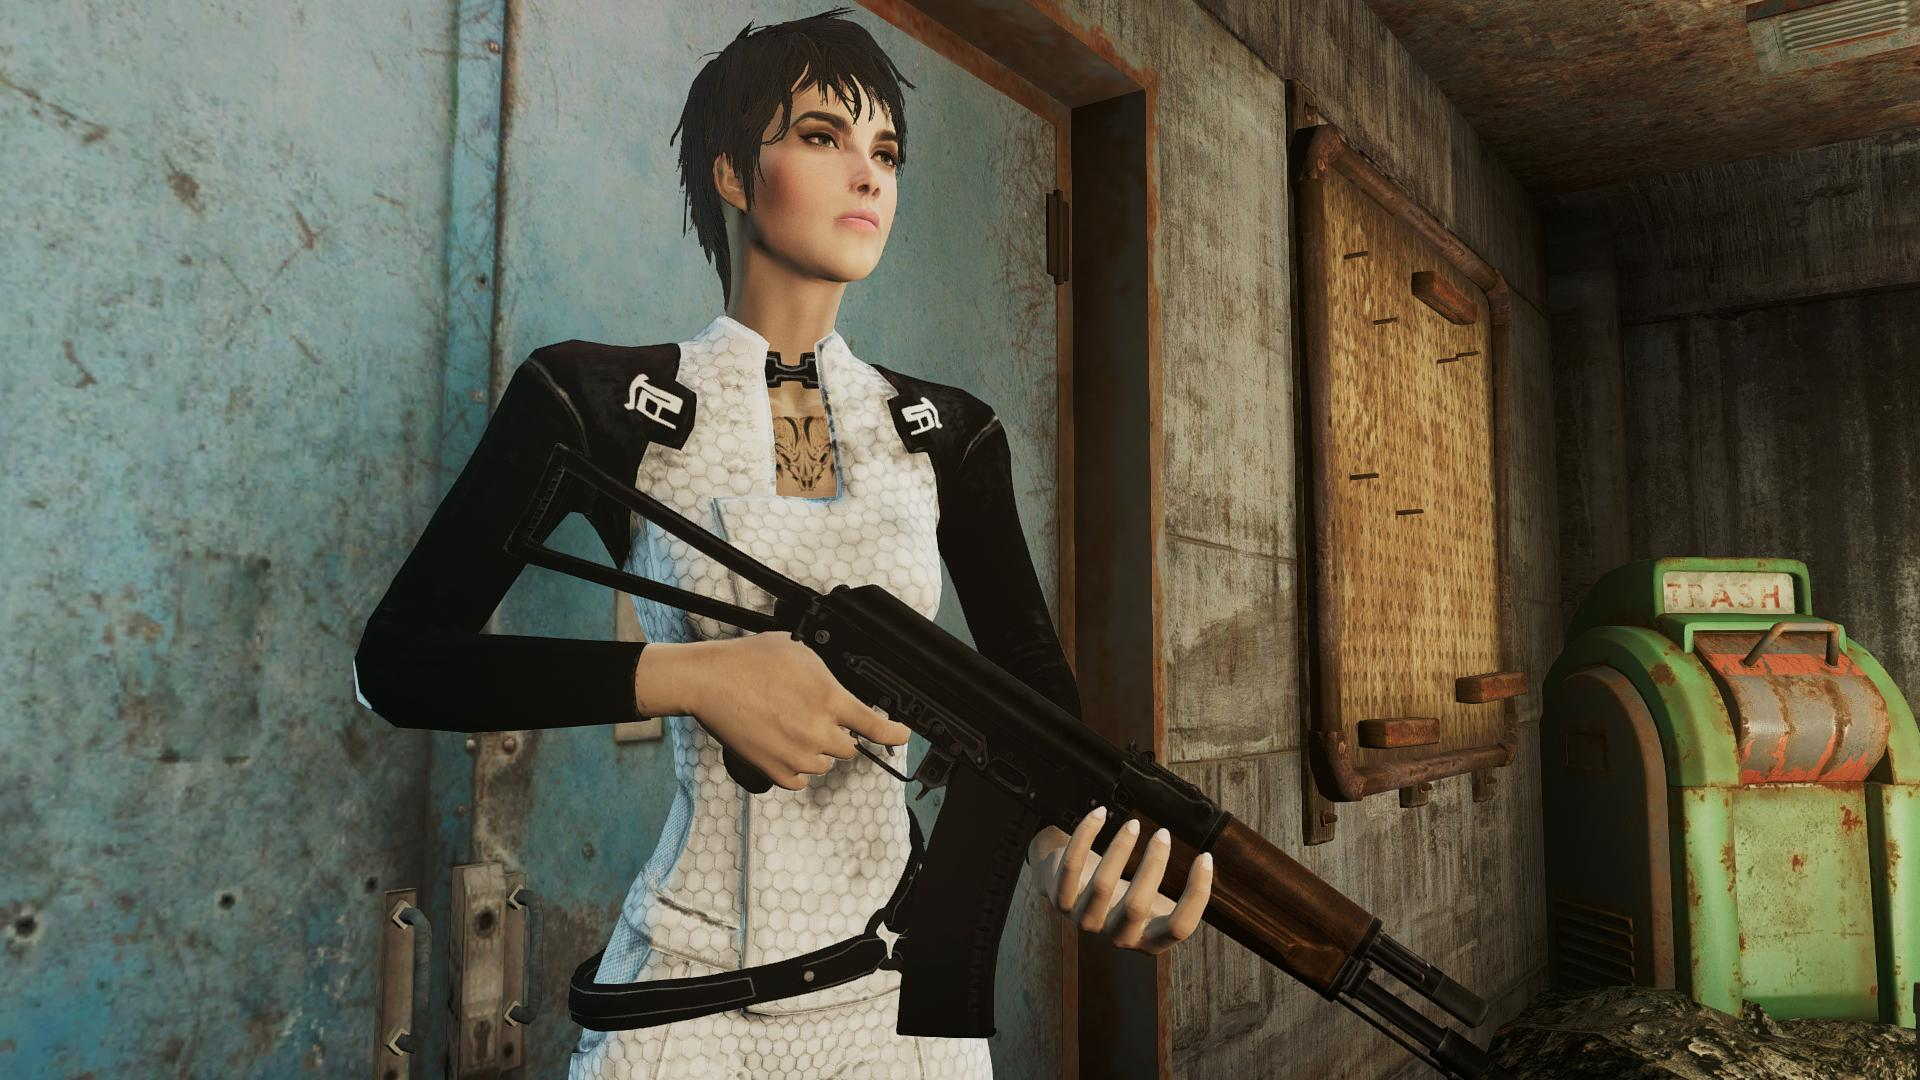 000570.Jpg - Fallout 4